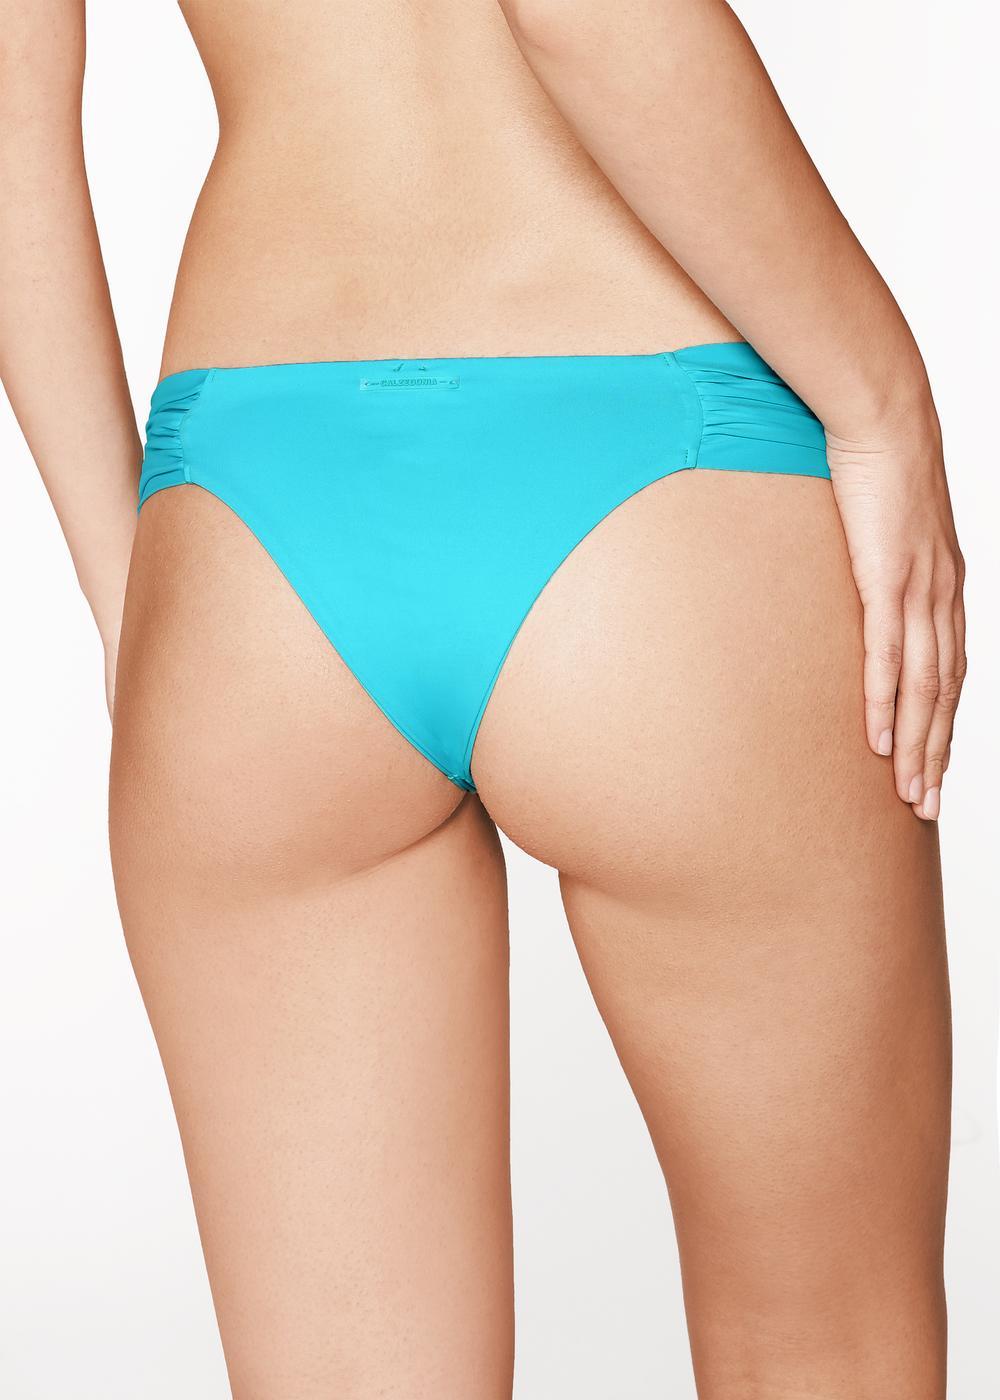 Slip Bikini Brasiliano Arriccio Indonesia